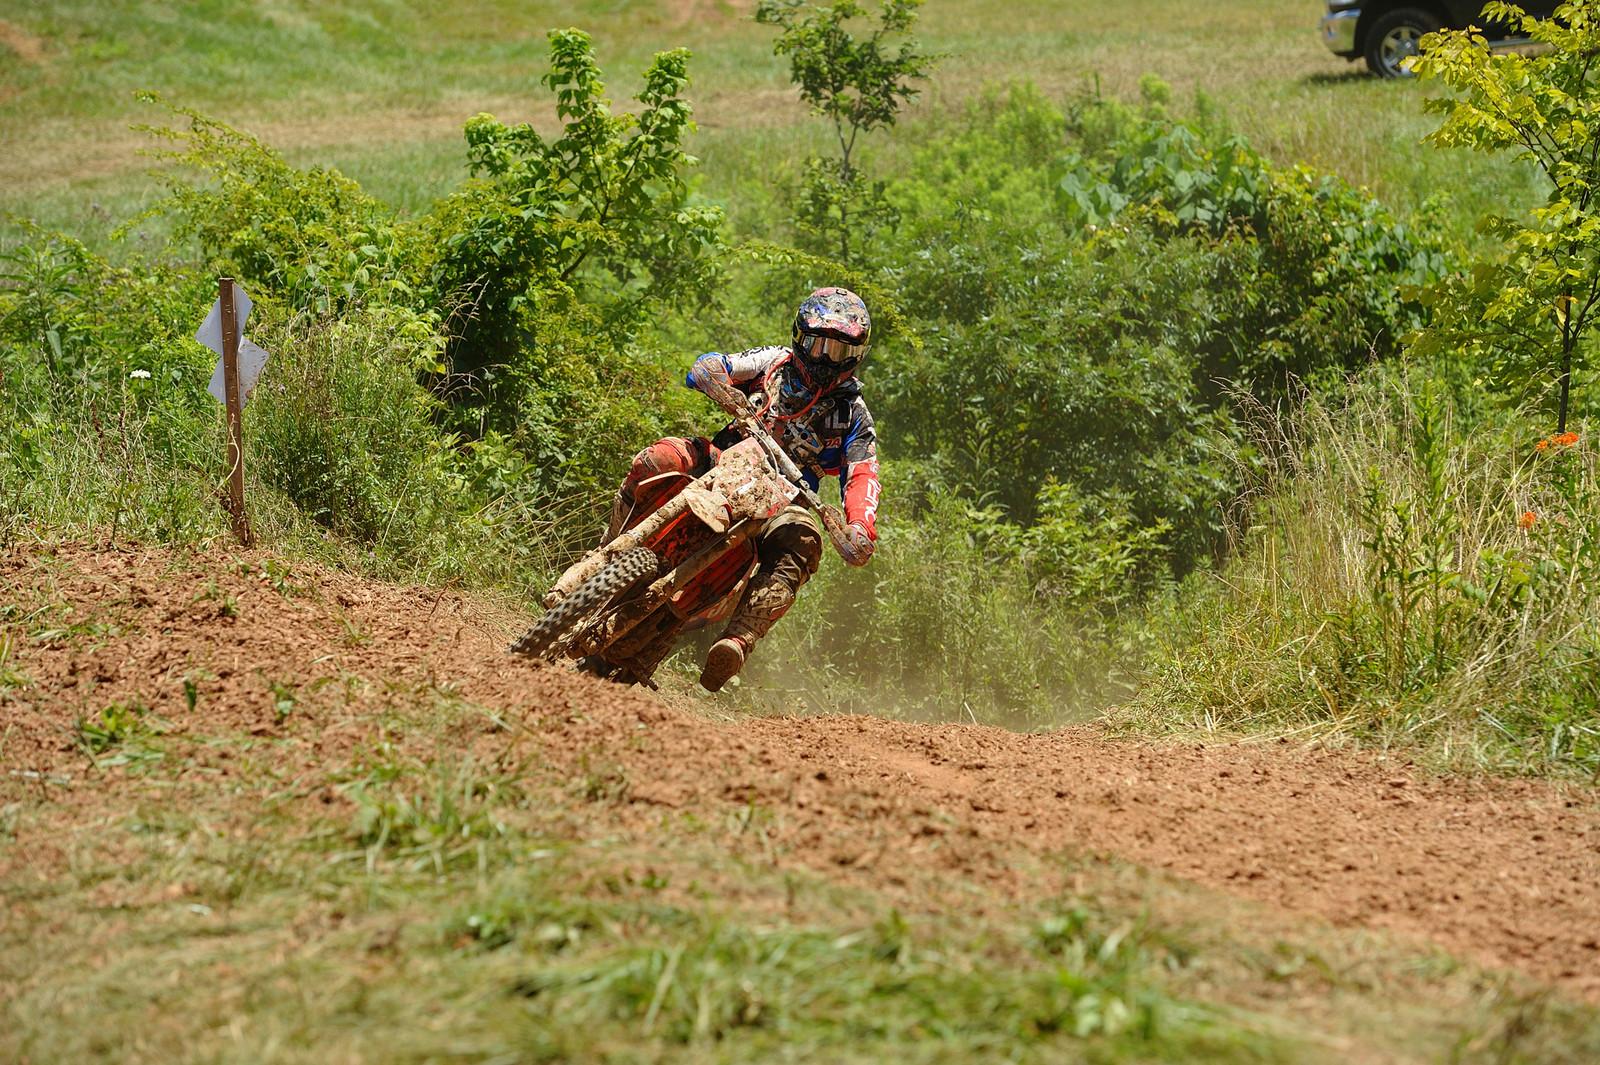 Steward Baylor - John Penton GNCC - Motocross Pictures - Vital MX